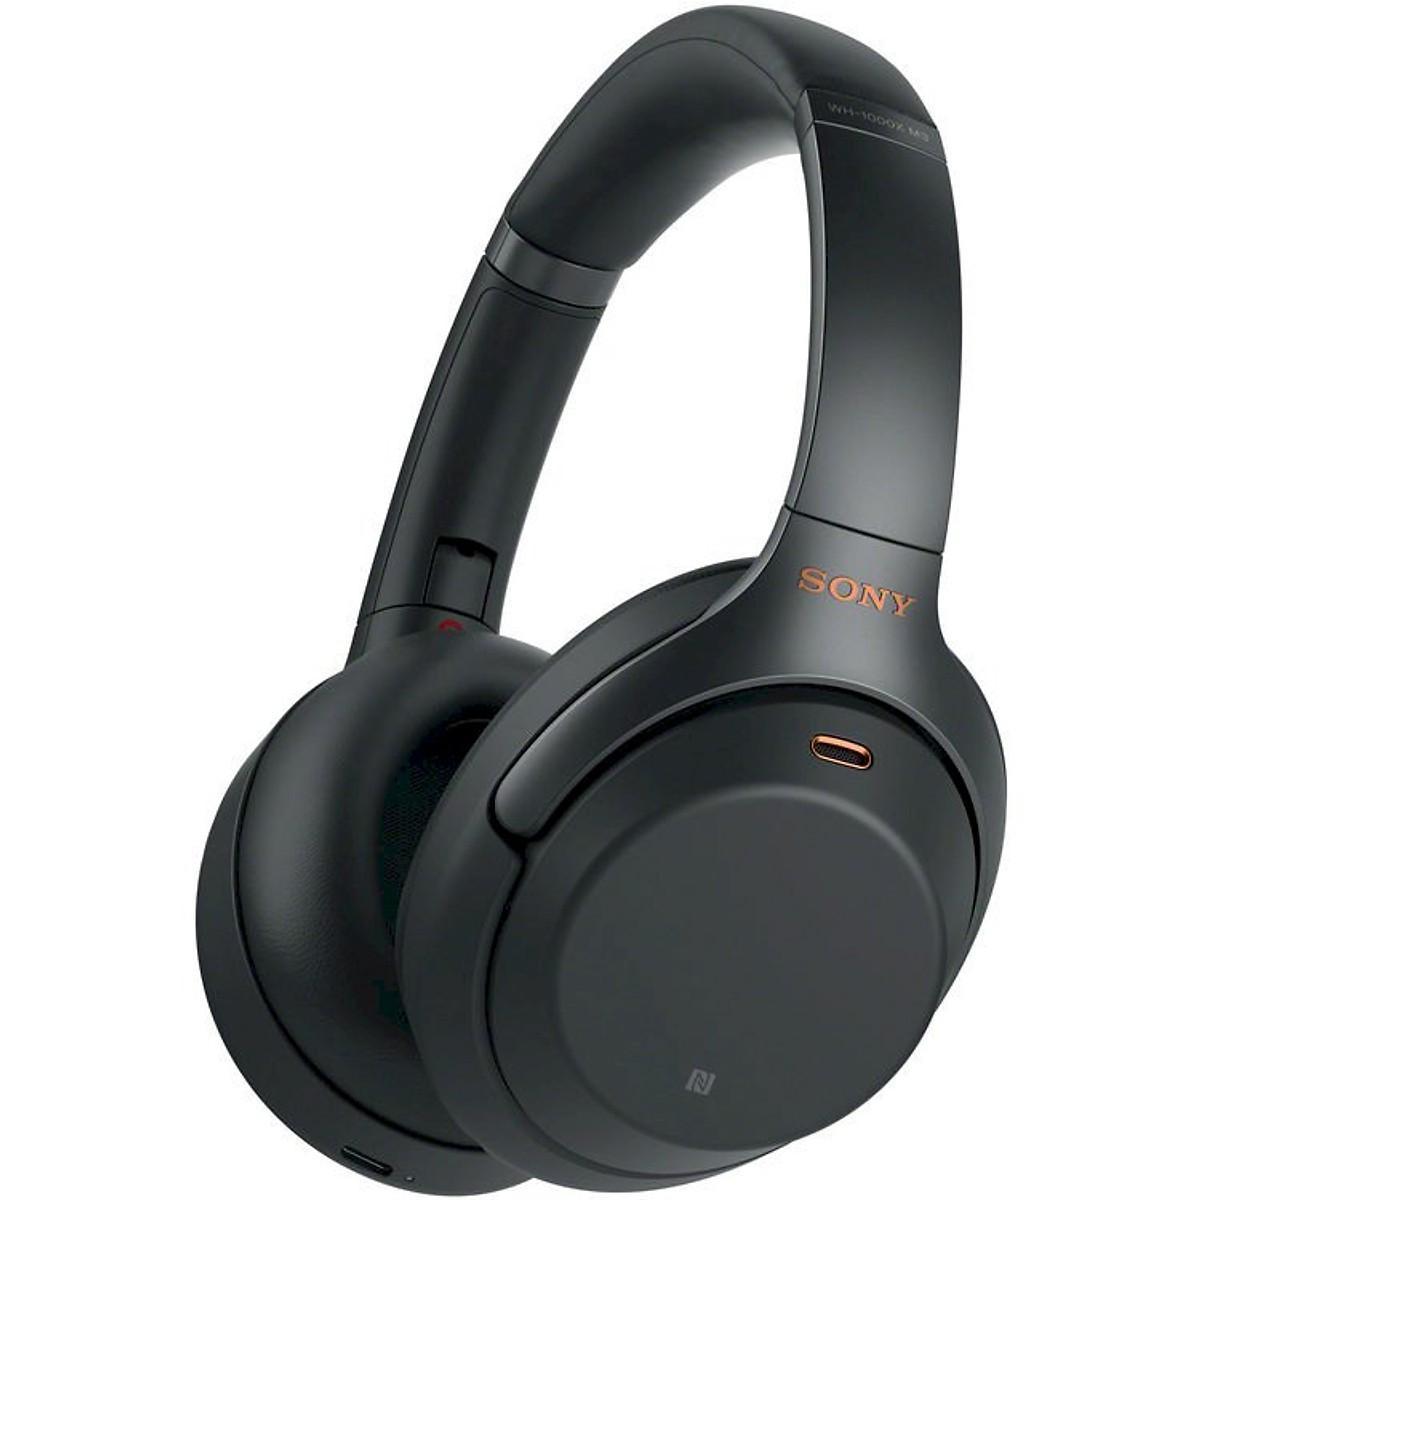 Tai Nghe Bluetooth Chụp Tai Sony WH-1000XM3 Hi-Res Noise Canceling (Đen)